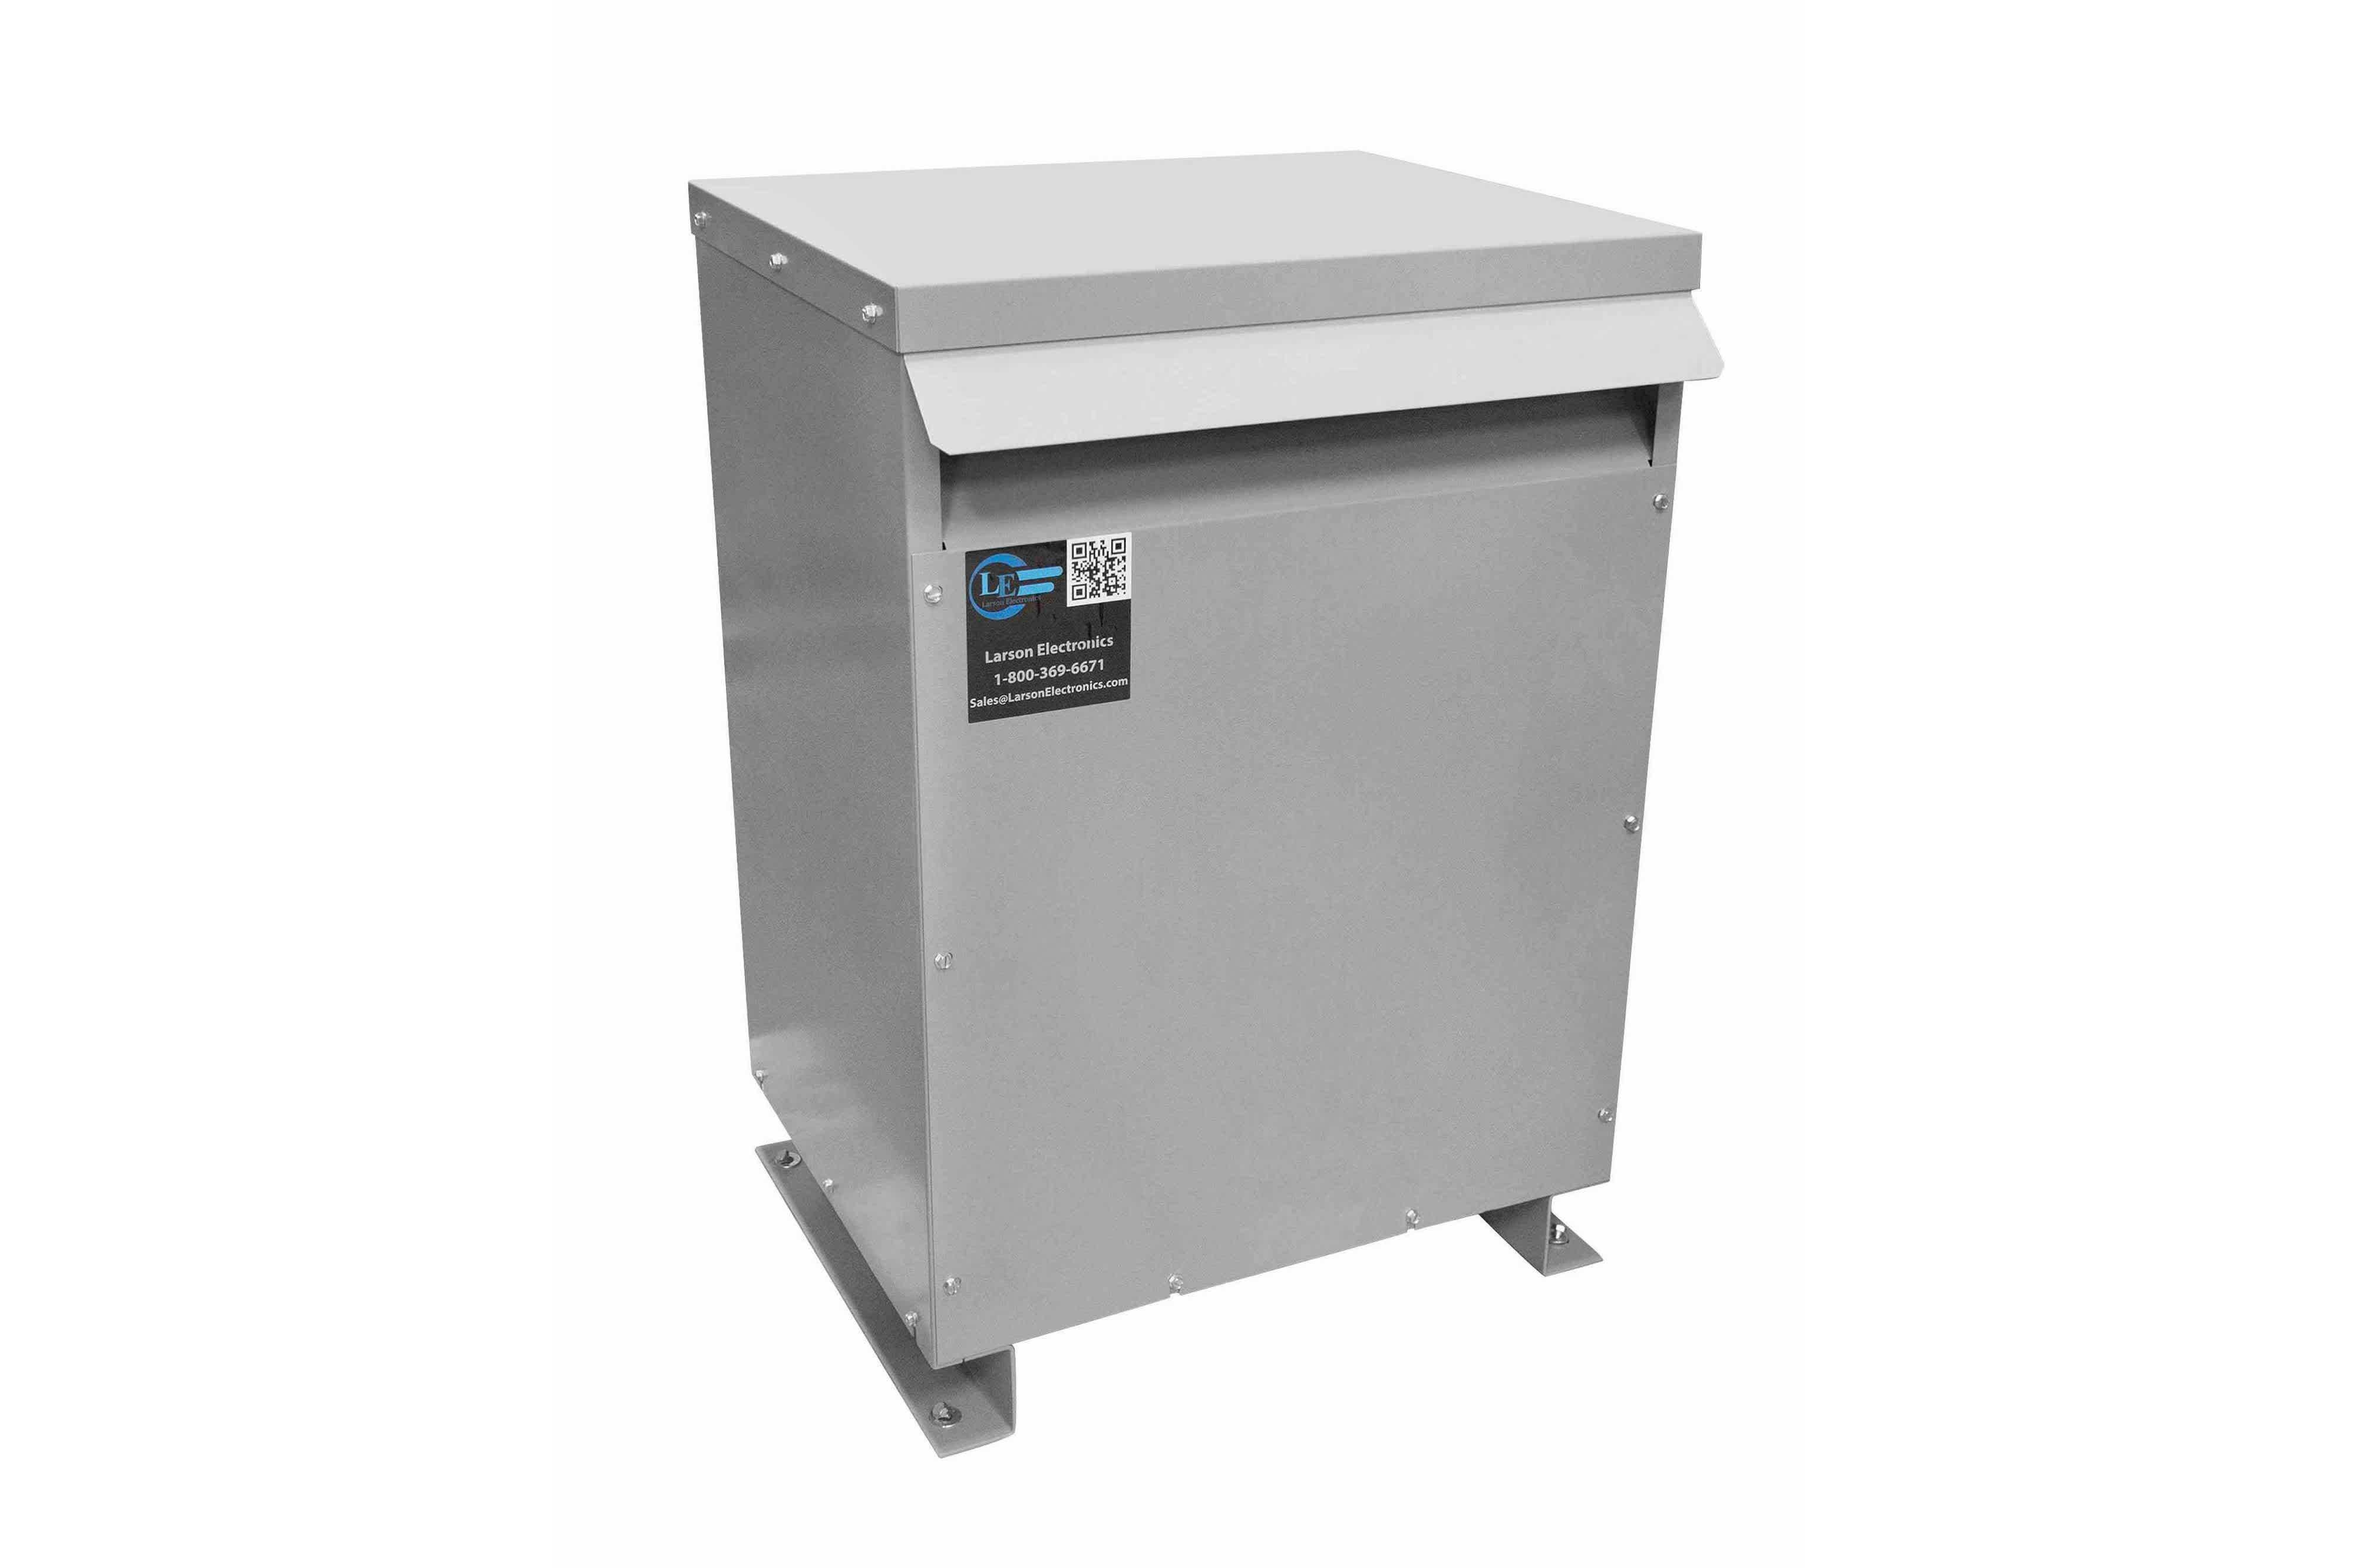 9 kVA 3PH Isolation Transformer, 400V Wye Primary, 480Y/277 Wye-N Secondary, N3R, Ventilated, 60 Hz